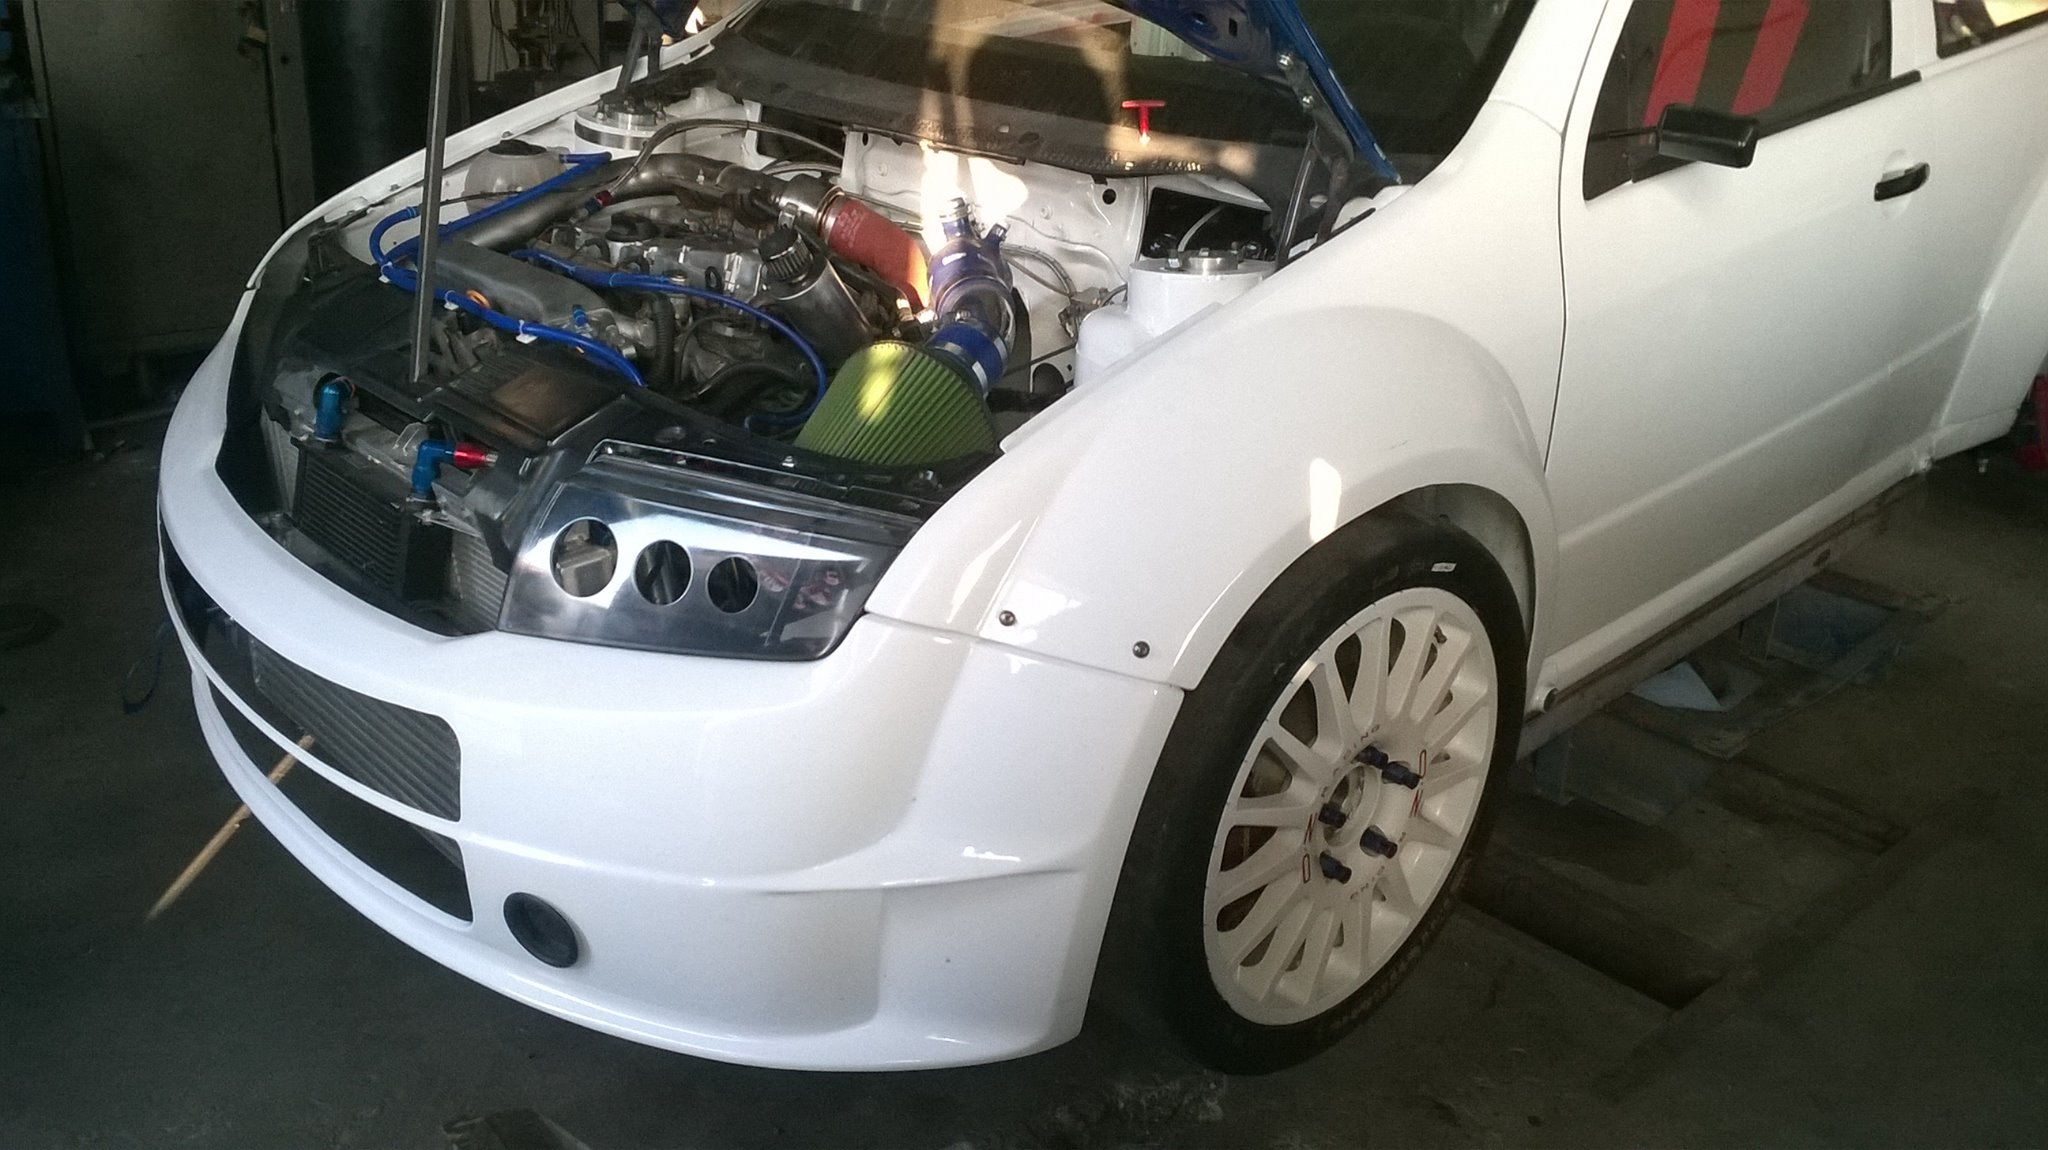 Skoda Fabia With An Audi 1 8t And Quattro 4wd Drivetrain Engine Swap Depot